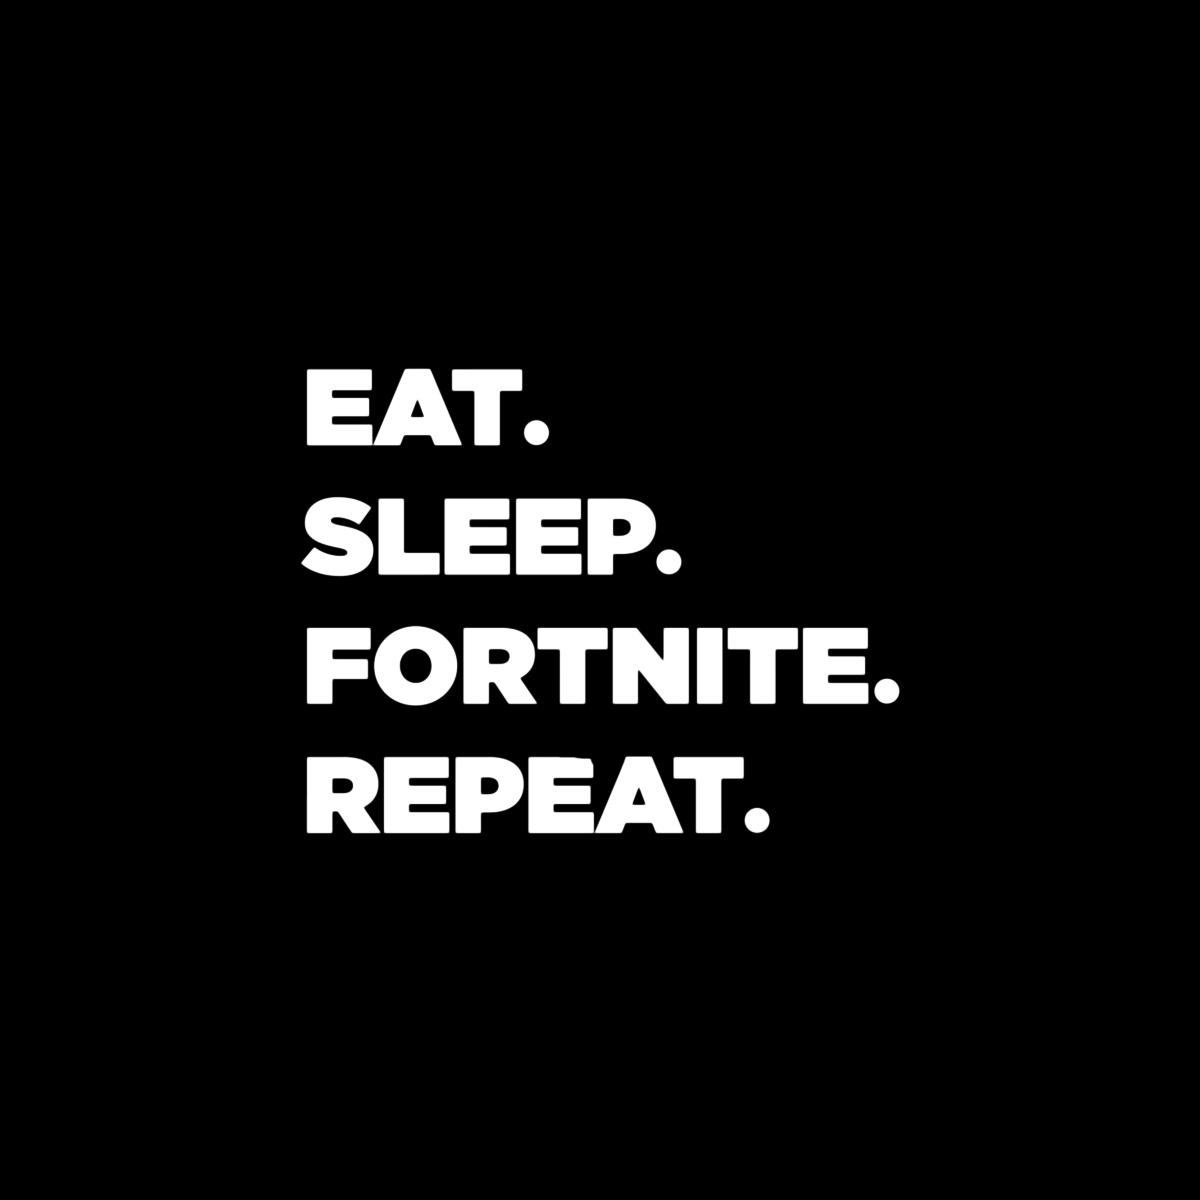 Fortnite Battle Royale Eat Sleep Fortnite Repeat